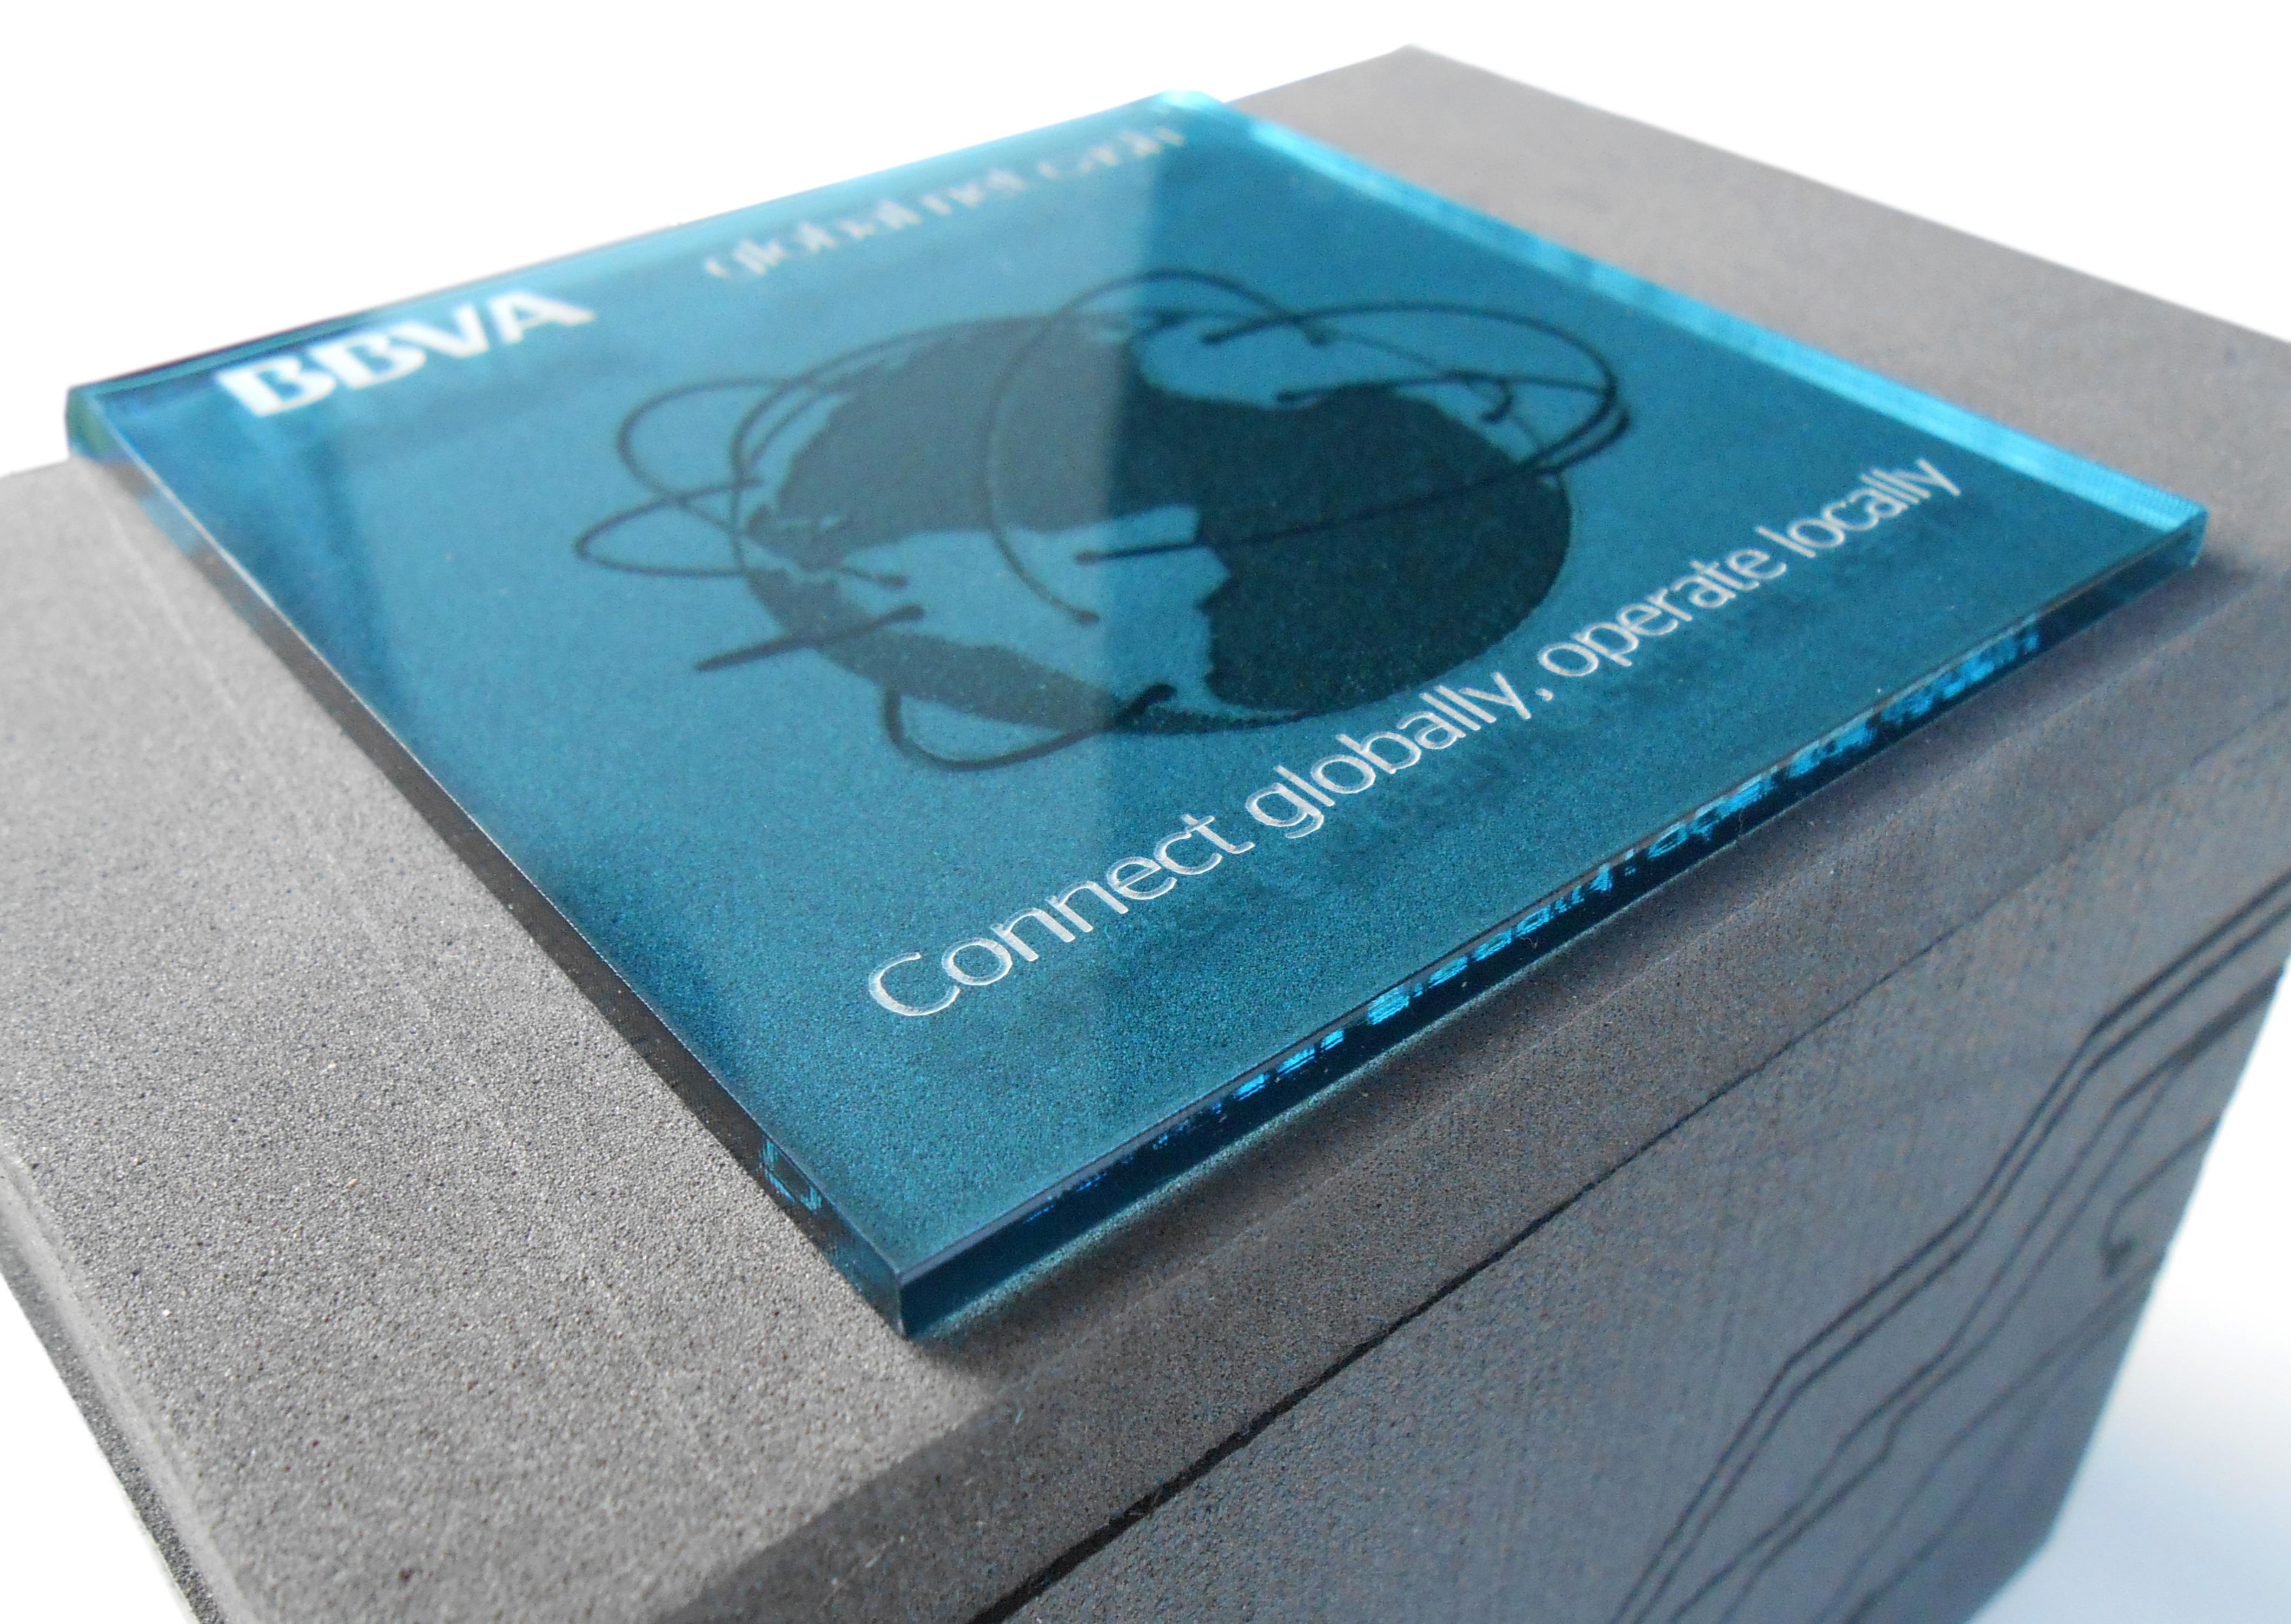 Packaging BBVA Global Net cash by aktuart - Mikel Rico - Creative Work